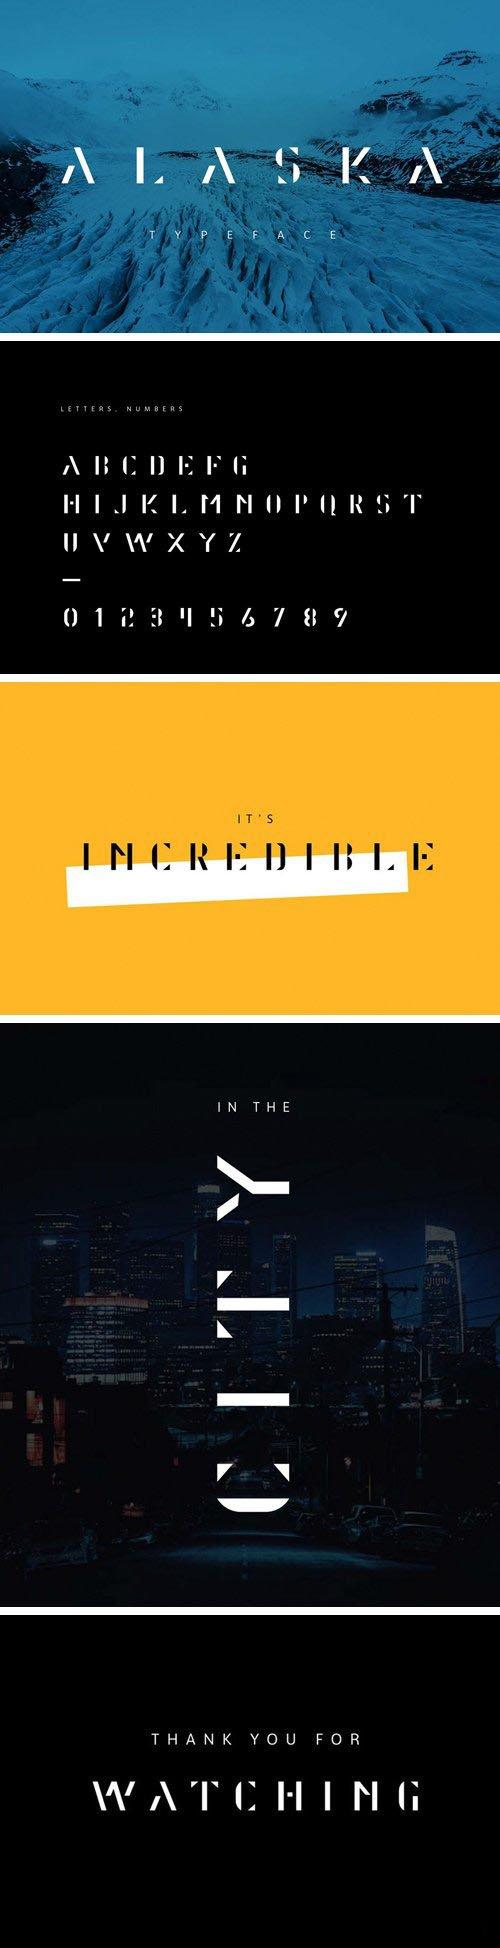 Alaska Stylized Abstract Typeface